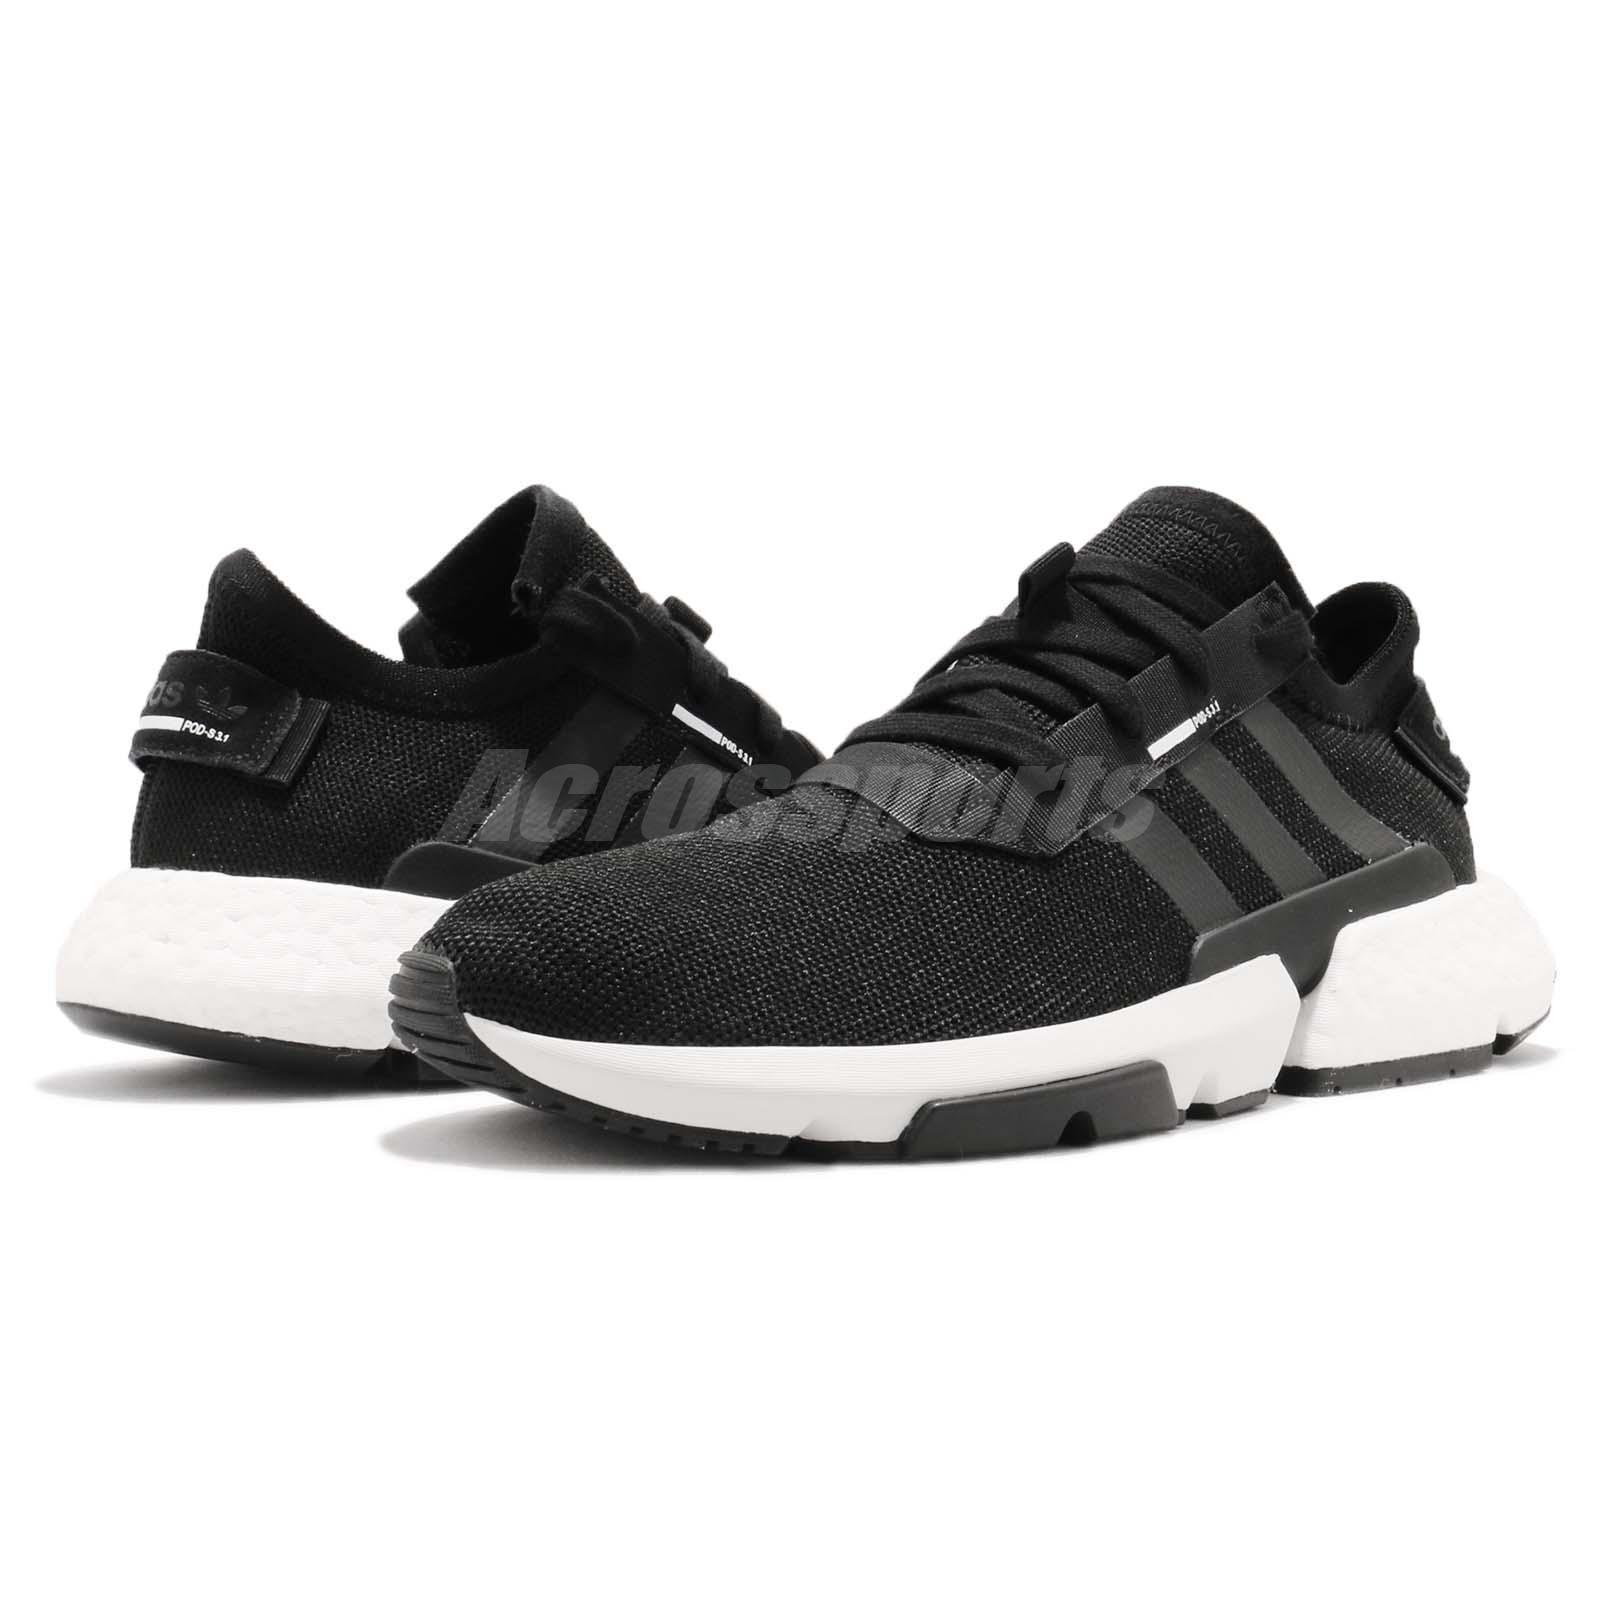 adidas Originals Pod-S3.1 System Boost Black White Men Running Shoes ... f1beadbb302